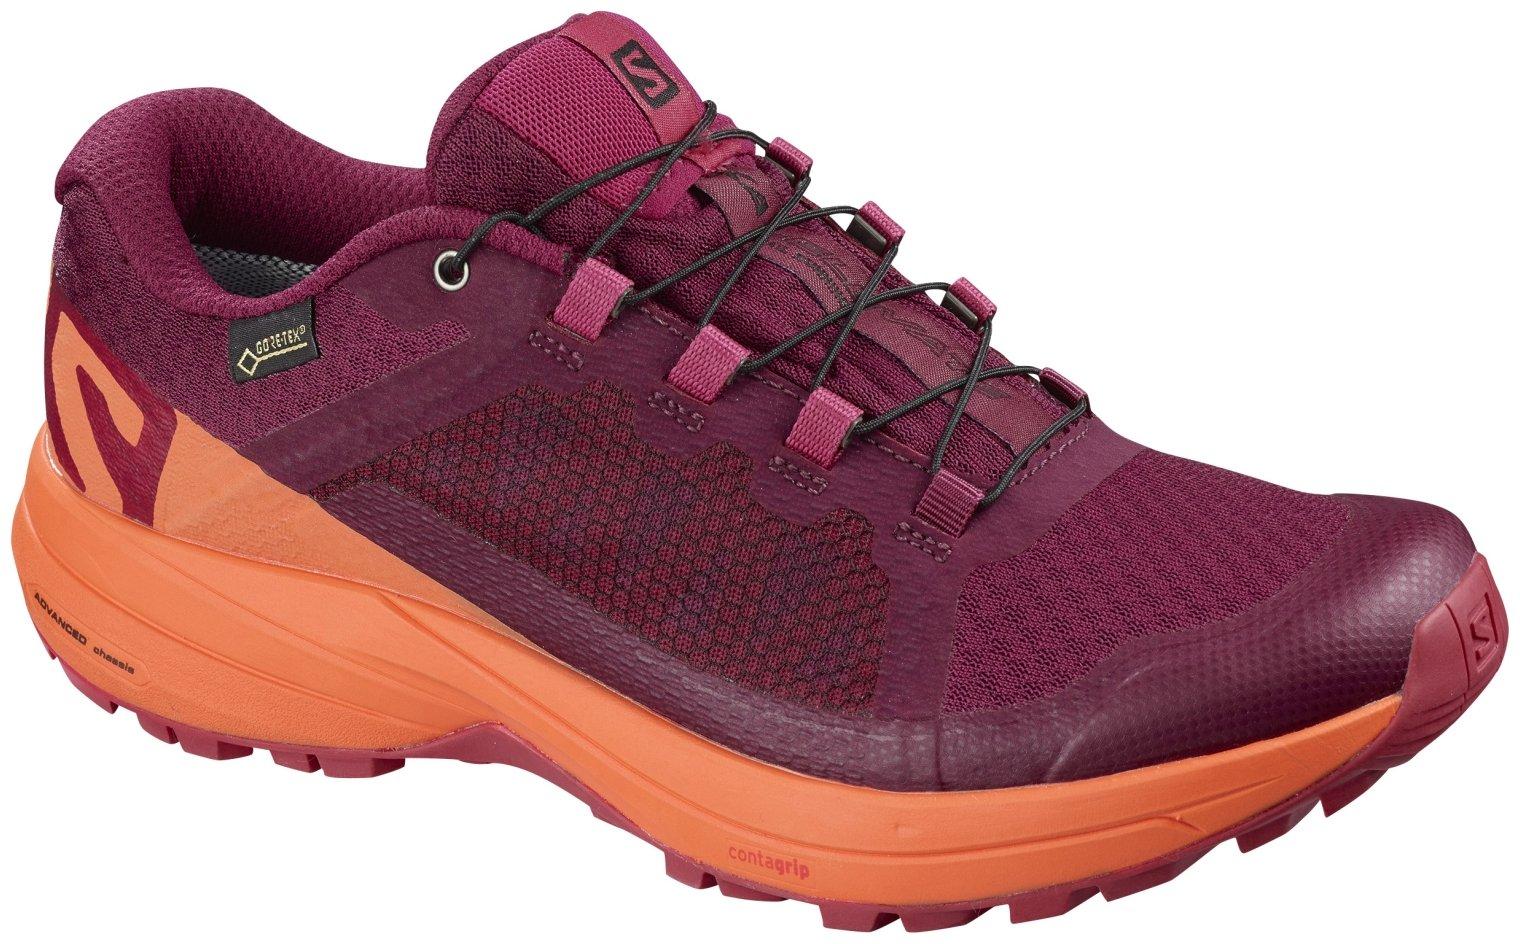 Salomon Women's XA Elevate GTX Running Shoes, Red, 6.5 M